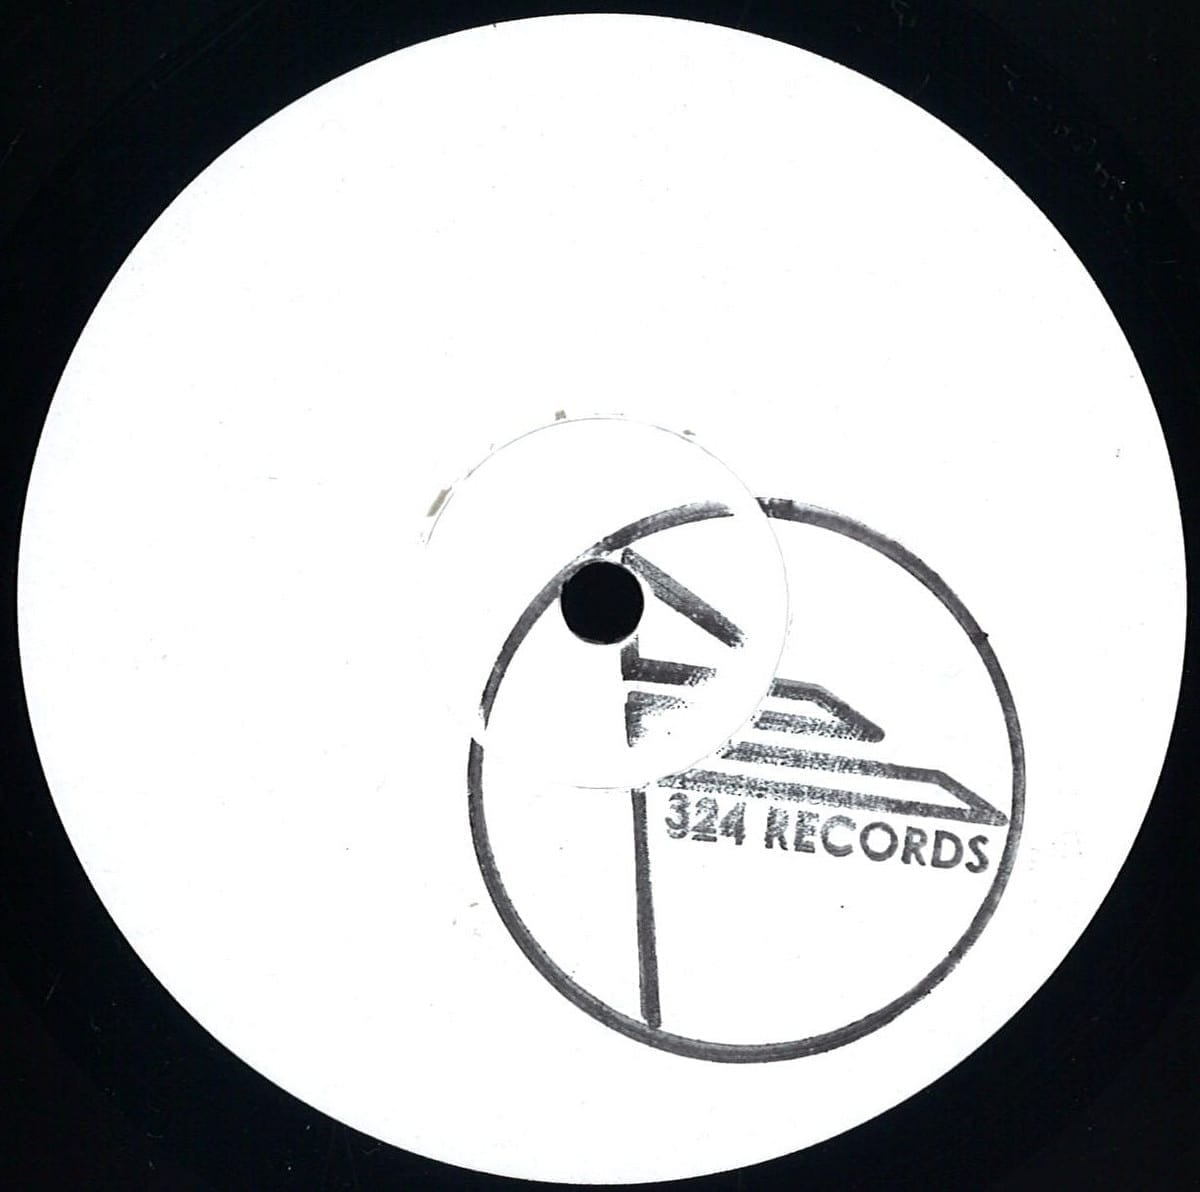 Lixir Biensur EP 324 Records